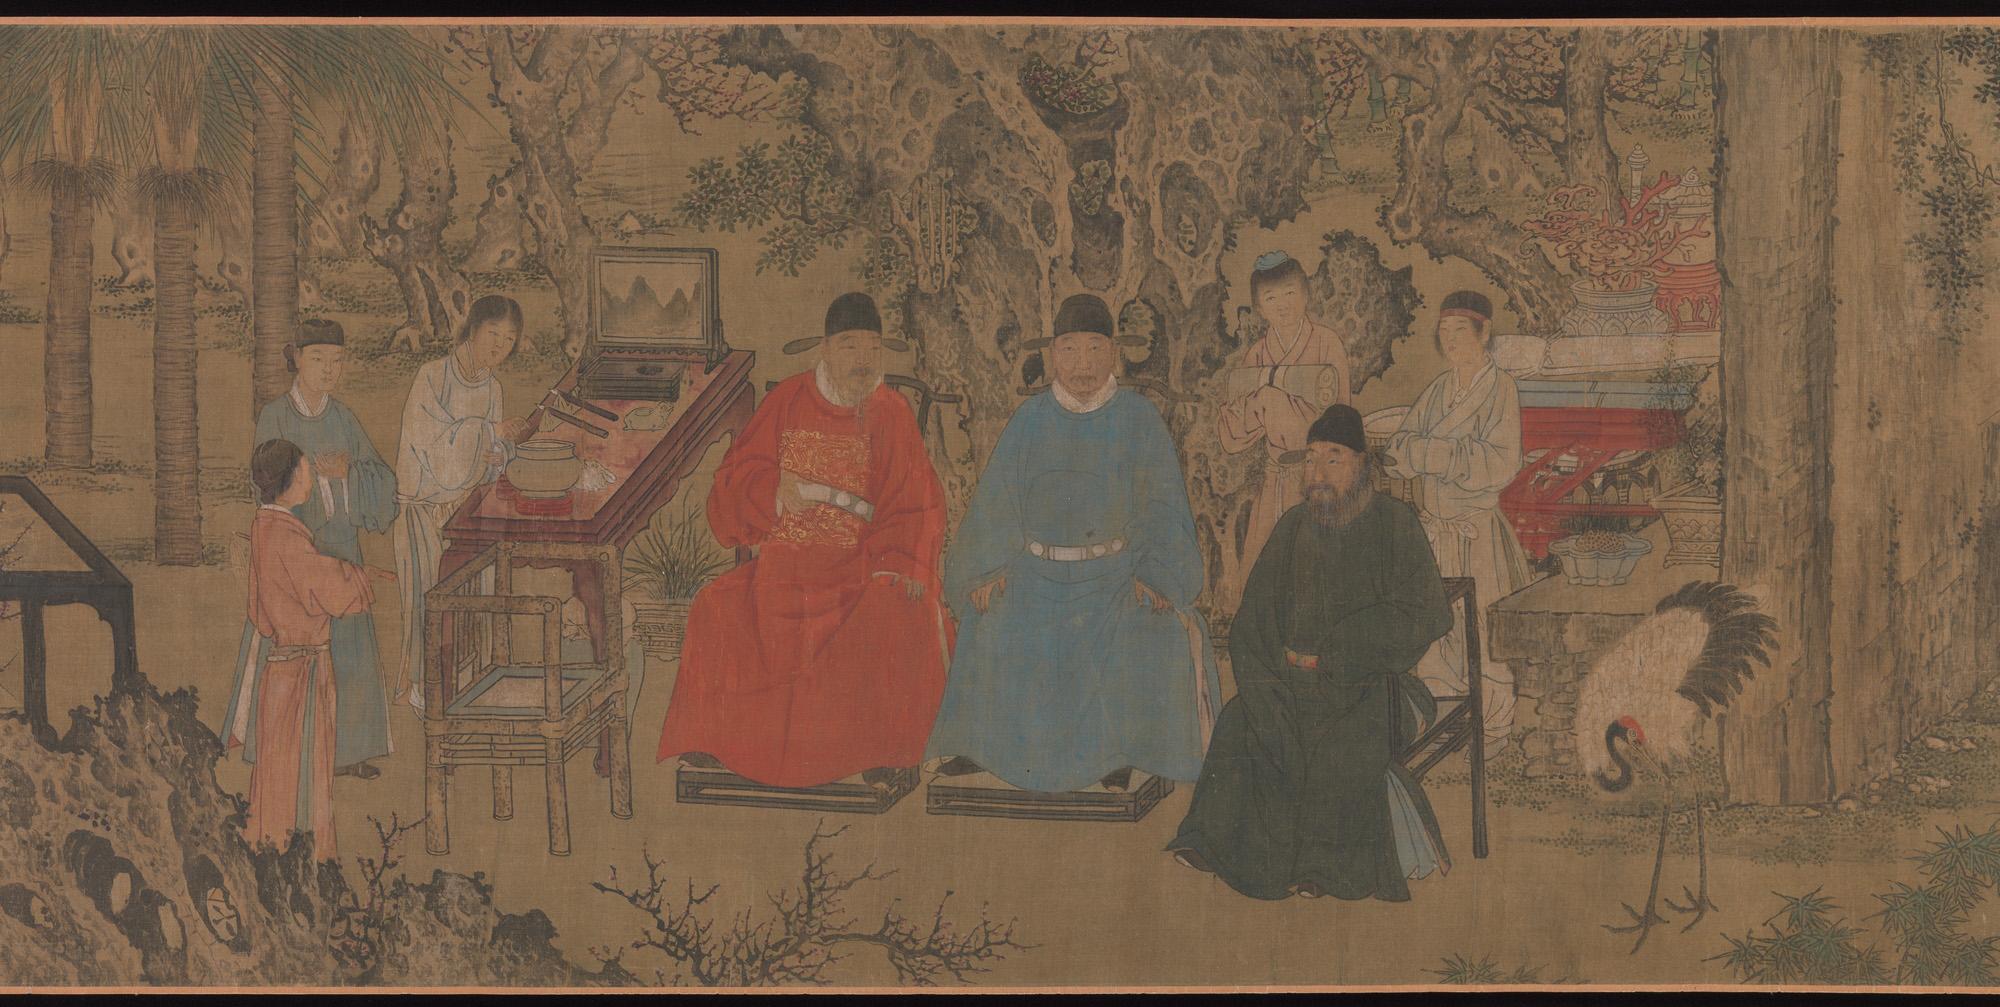 After Xie Huan